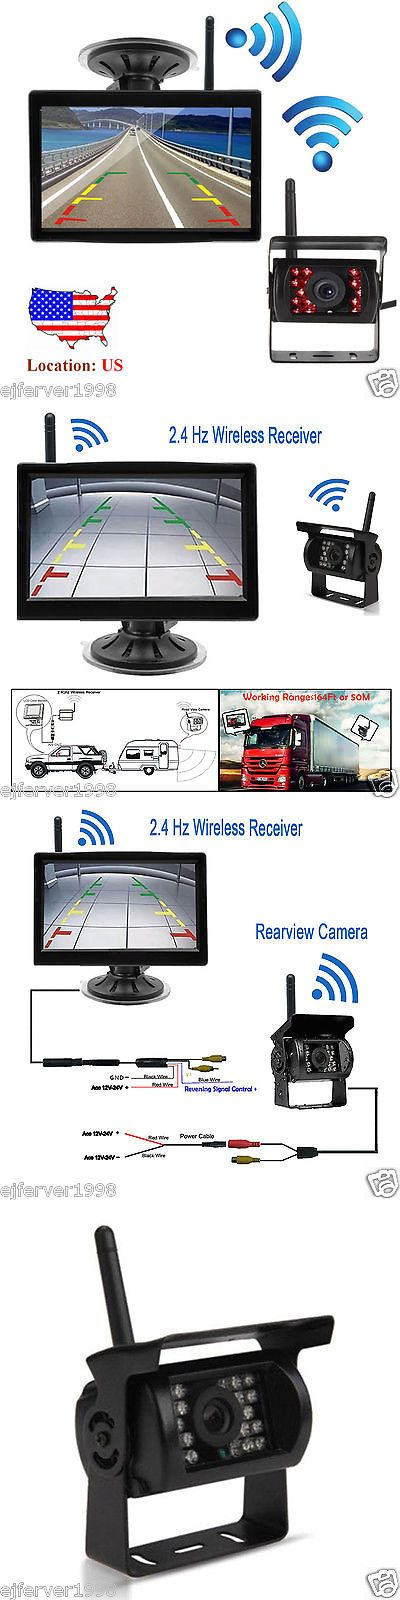 77474f0fb20cd289a310873da27daf62 rv truck trucks best 25 backup camera for truck ideas on pinterest rv backup rosco backup camera wiring diagram at alyssarenee.co